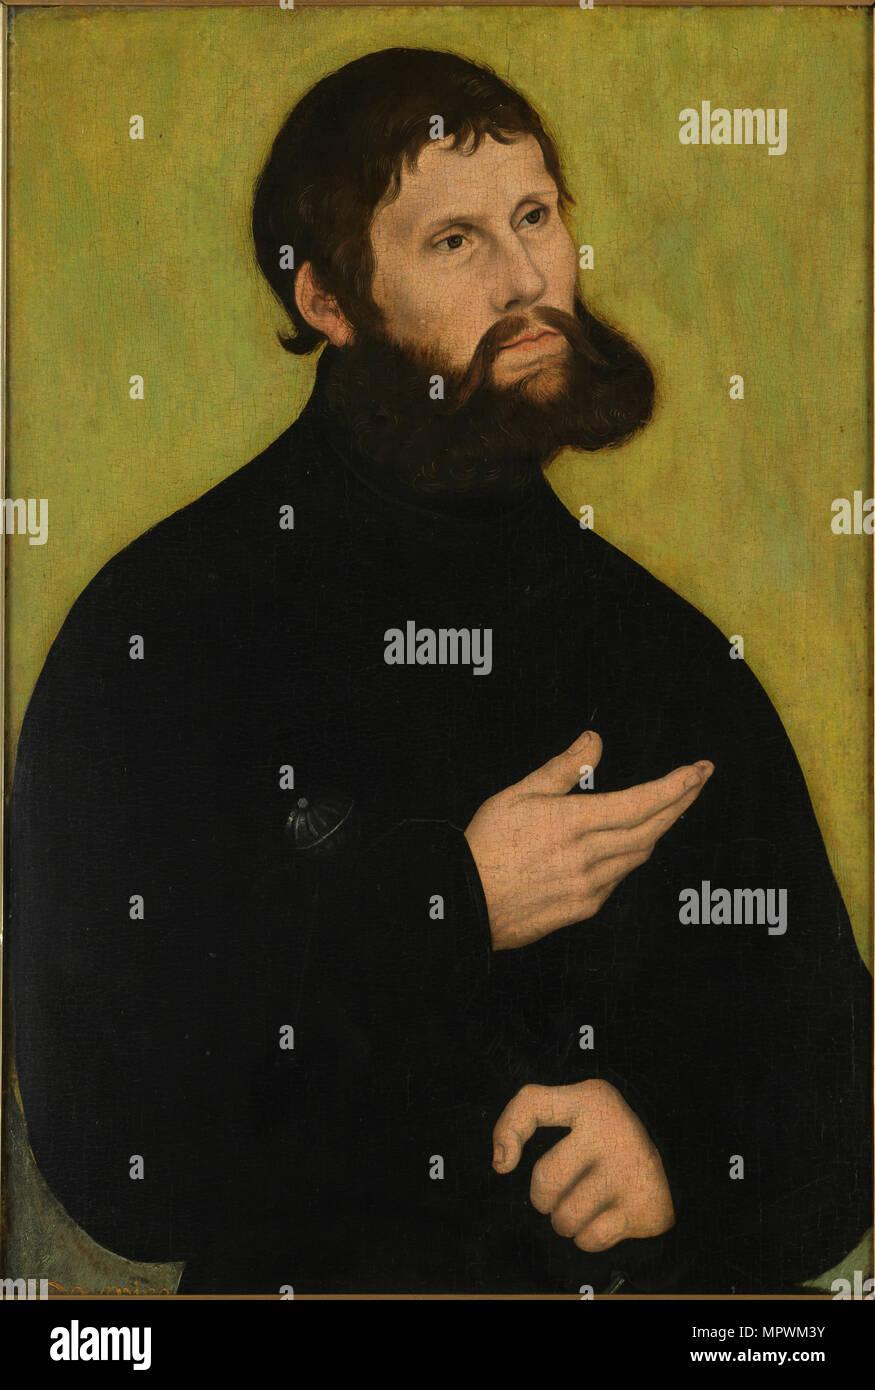 Portrait of Luther (1483-1546) as Junker Jörg, ca 1521. - Stock Image